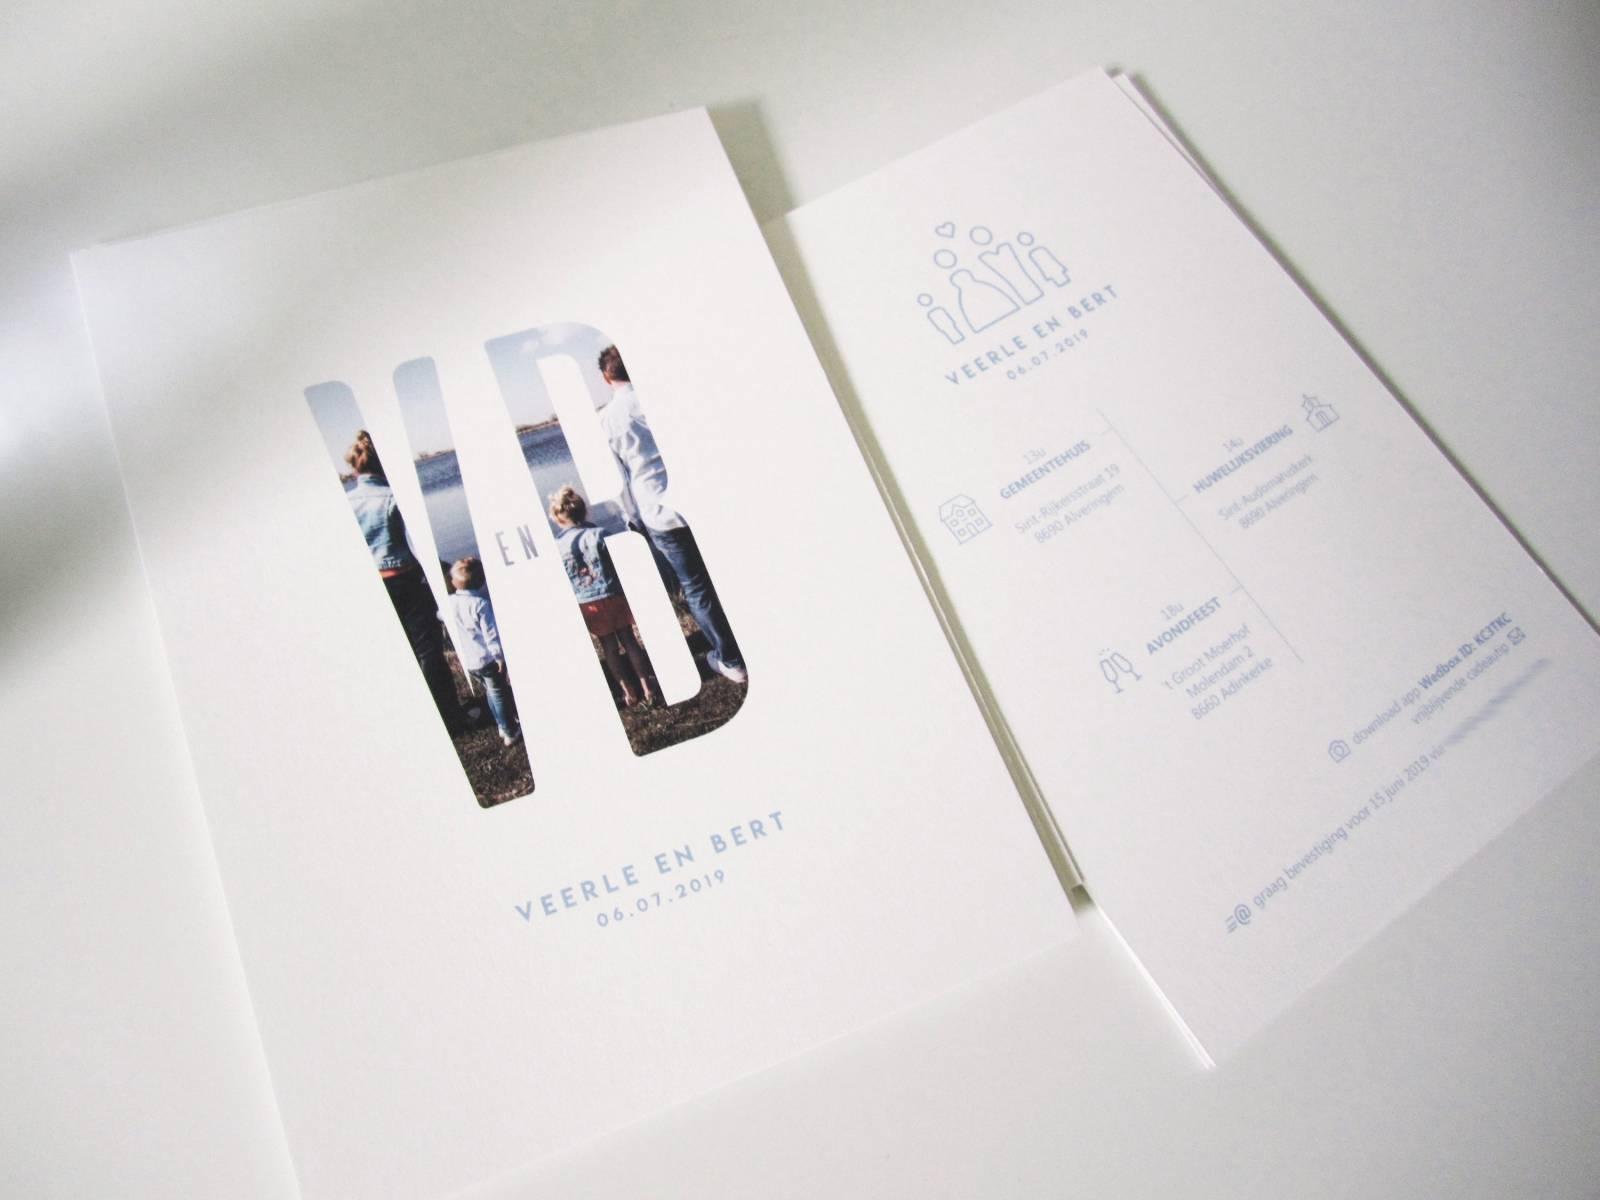 PlanMien - Trouwuitnodigingen en drukwerk - House of Weddings (11)